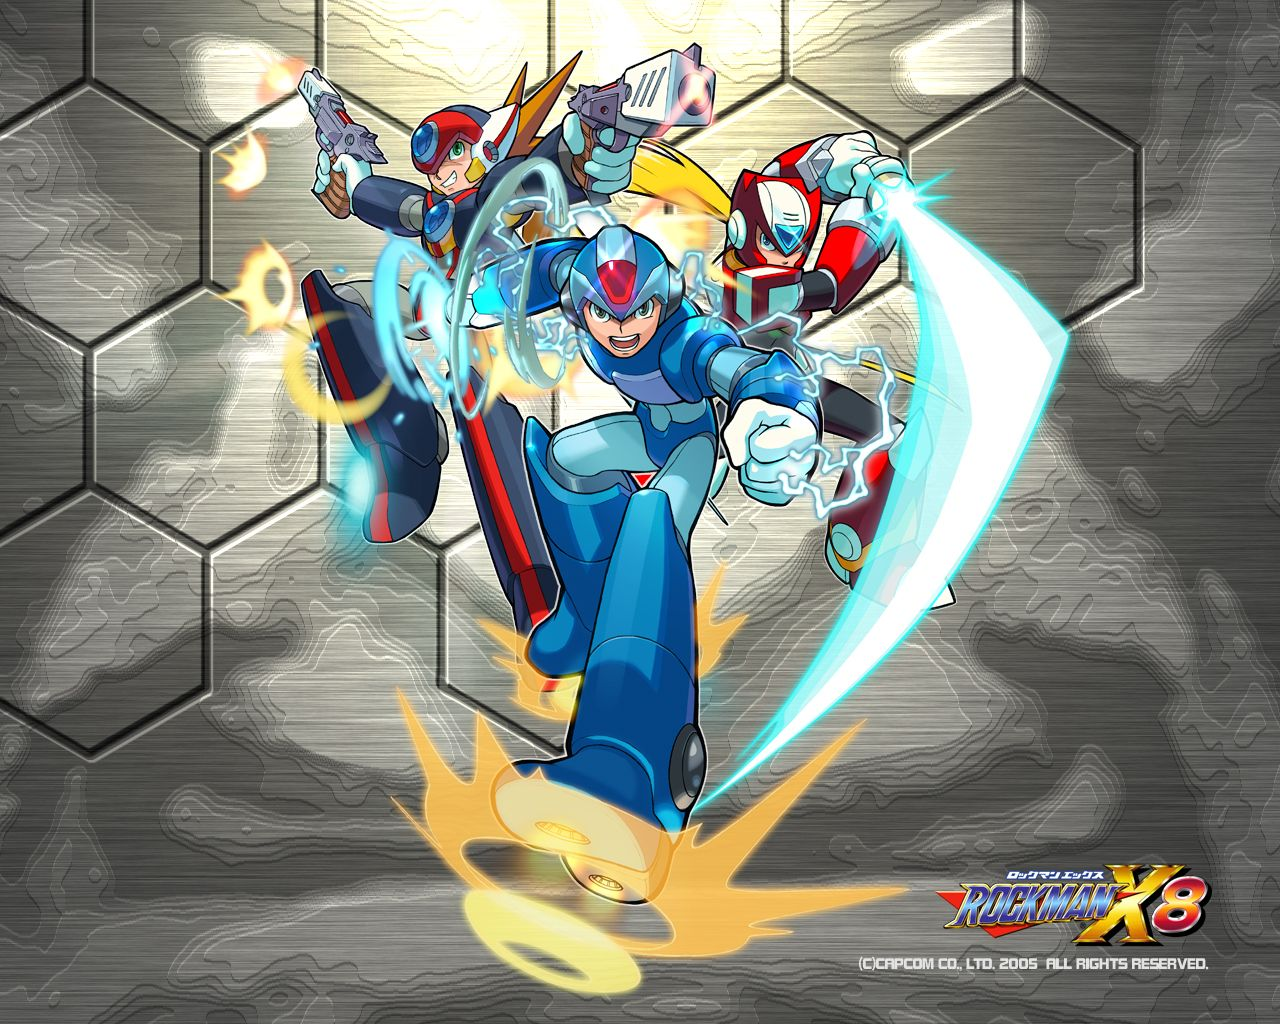 Zero Megaman X Wallpaper Anime Wallpaper Character Wallpaper Anime